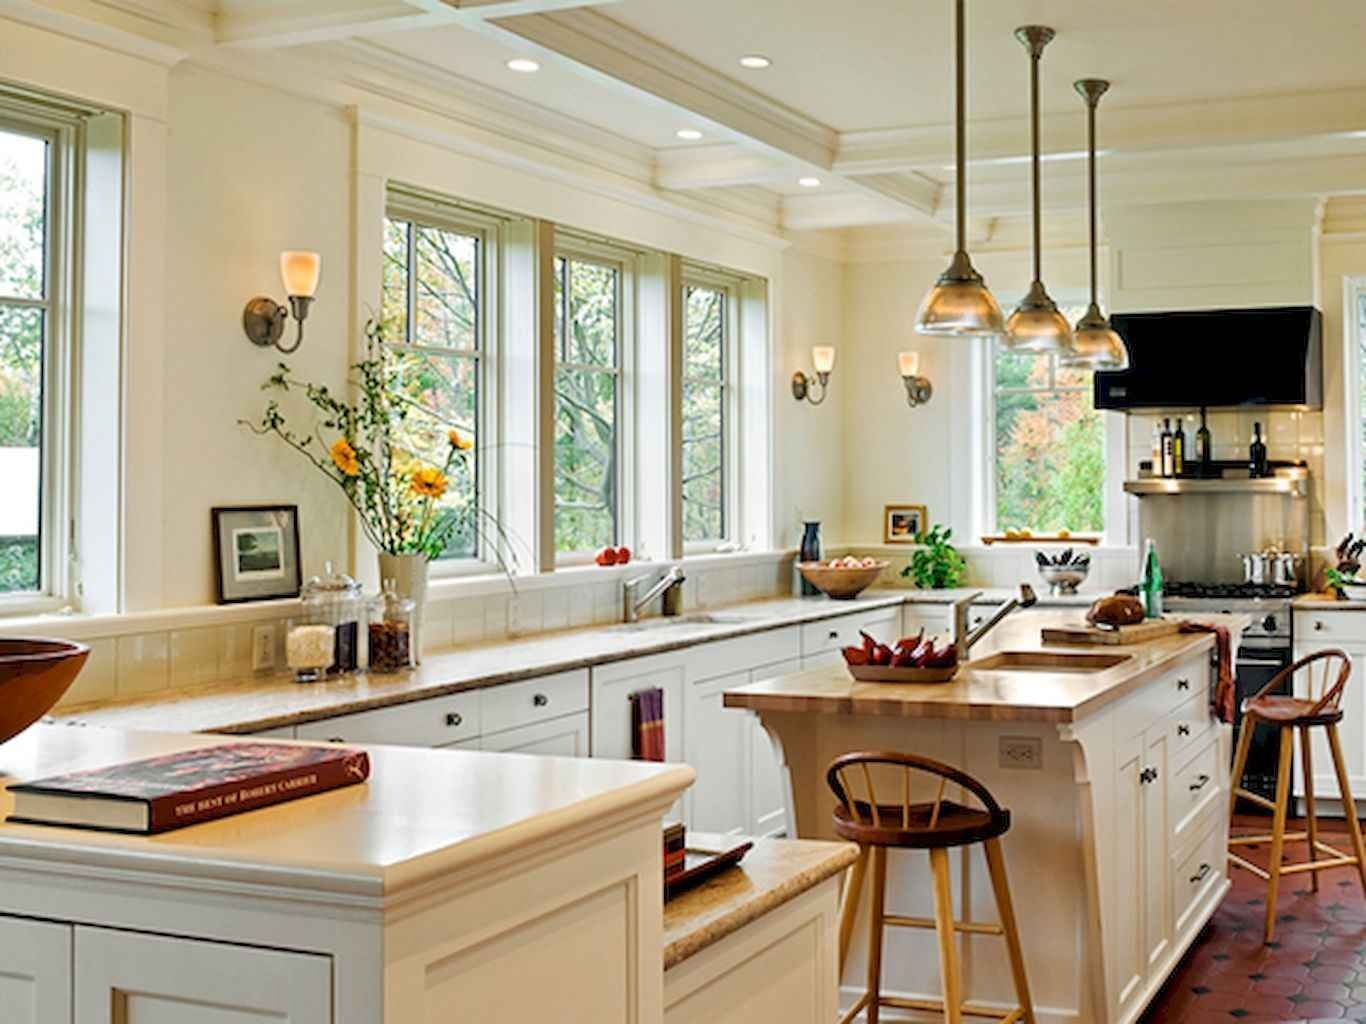 80 Modern Farmhouse Kitchen Lighting Decor Ideas and Remodel 36 kitchen #80 #modern #farmhouse #kitchen #lighting #decor #ideas #and #remodel #36